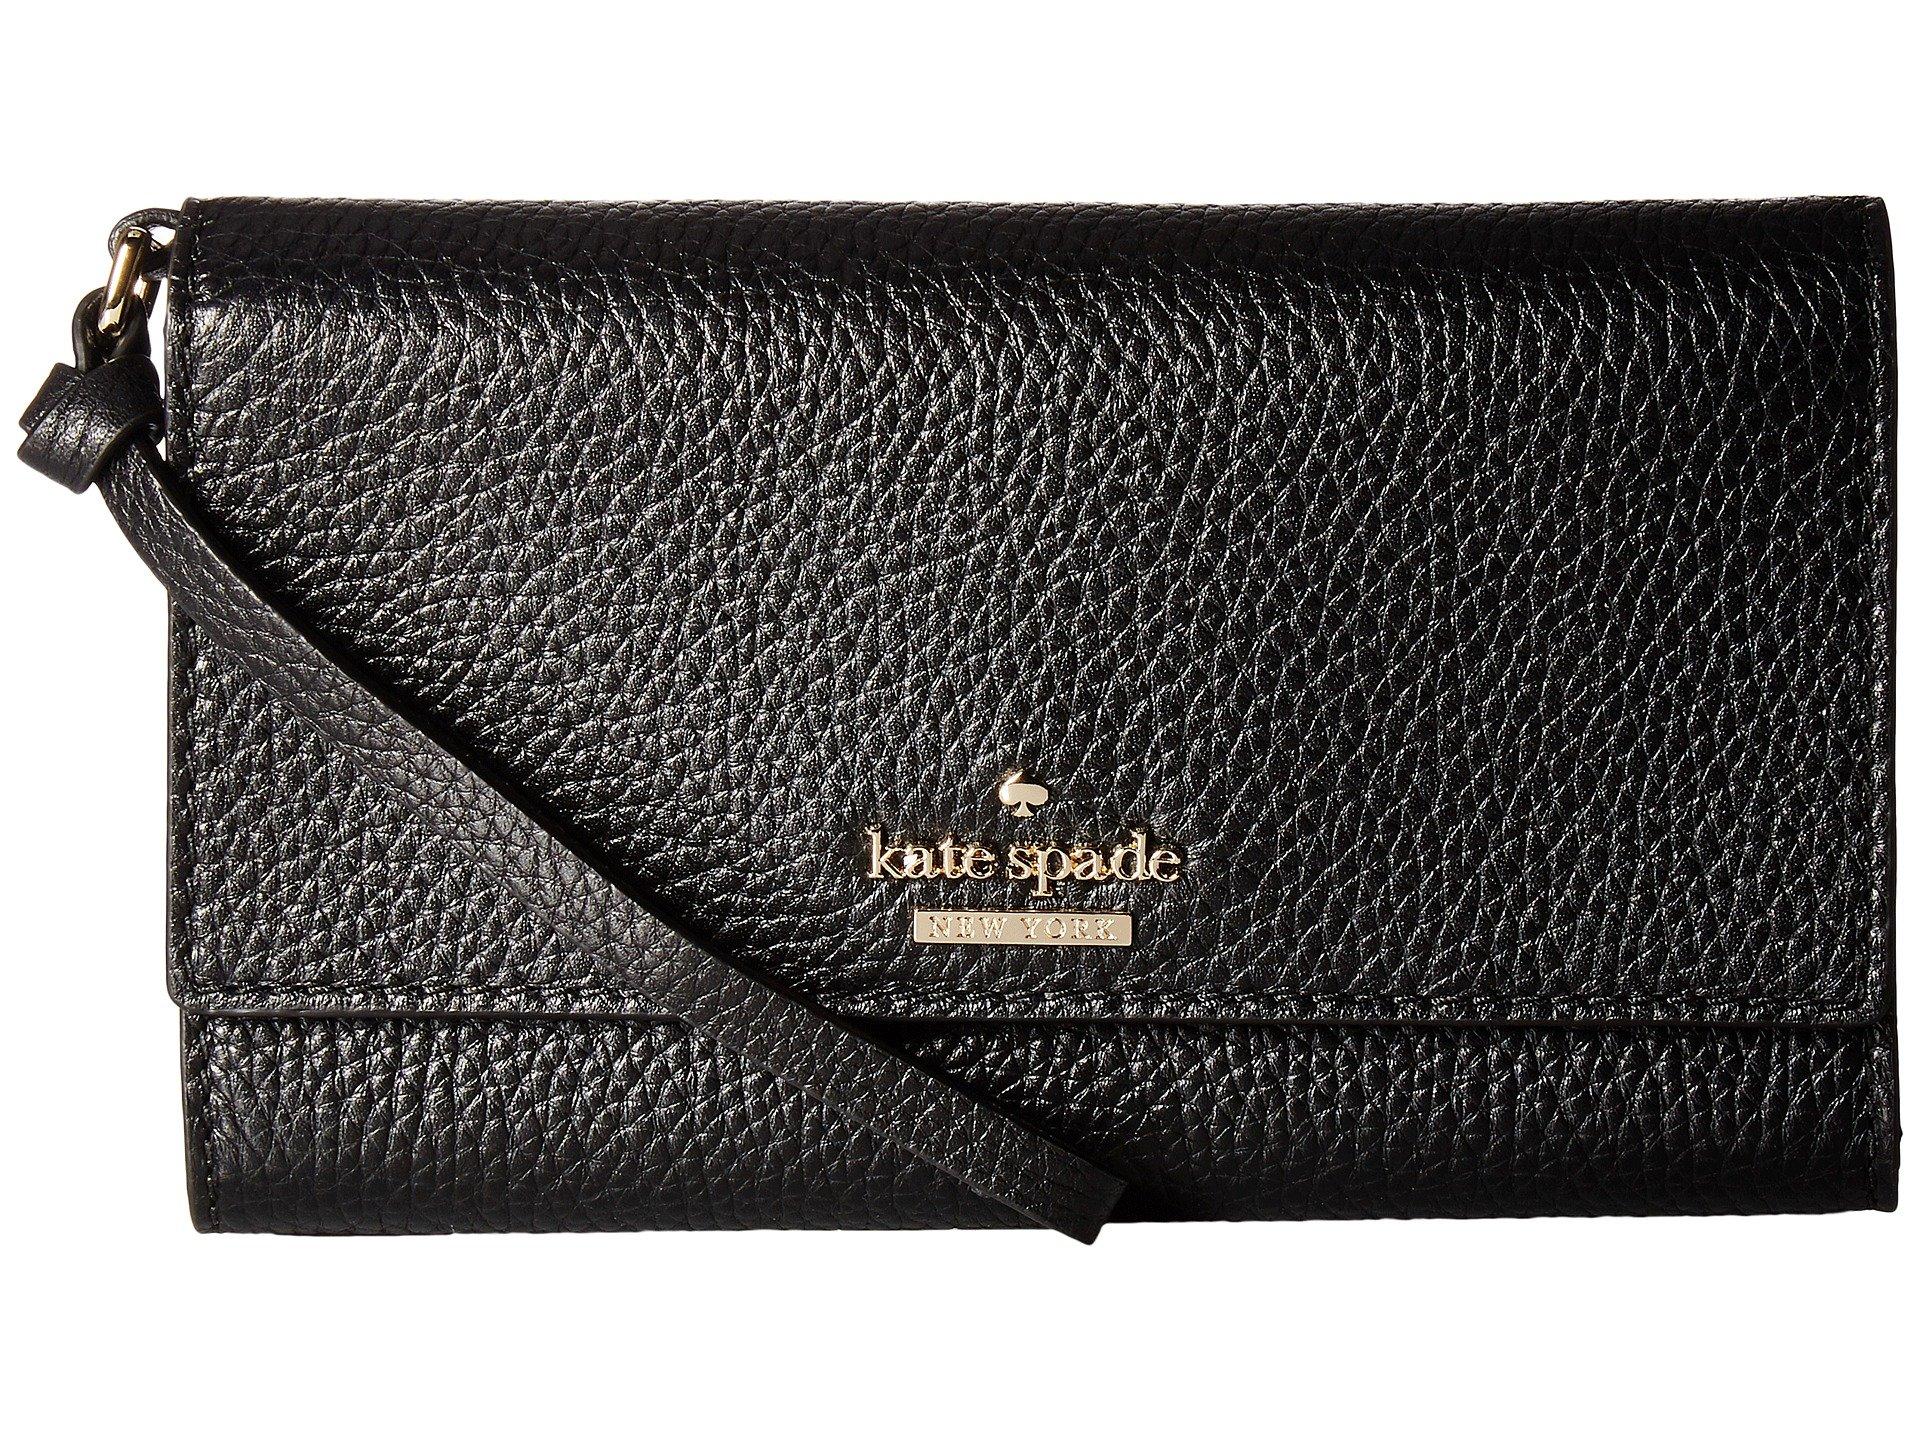 New Kate Spade New York Jackson Street Malorie Wallet, Black